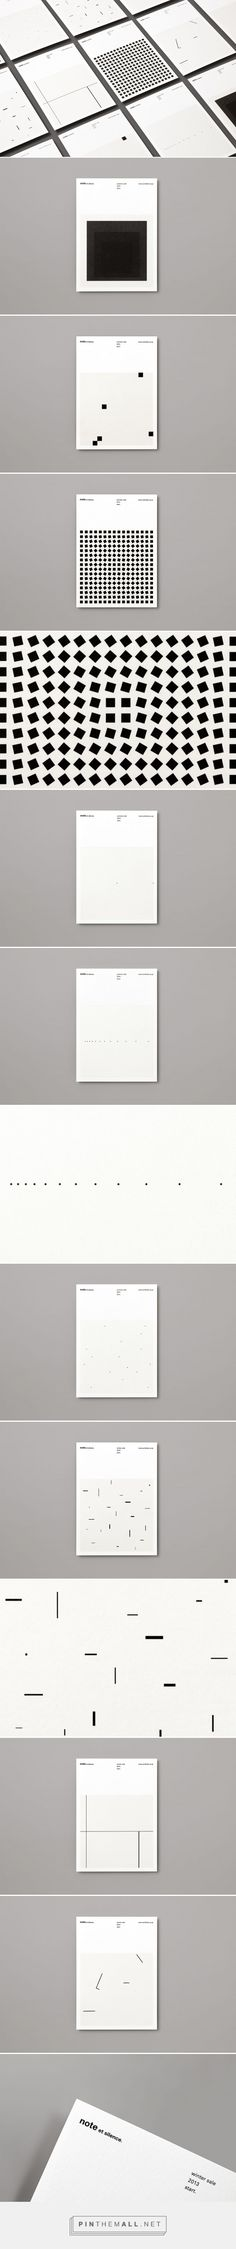 #print #design #layout © Makoto Kamimura - note et silence. - created via https://pinthemall.net